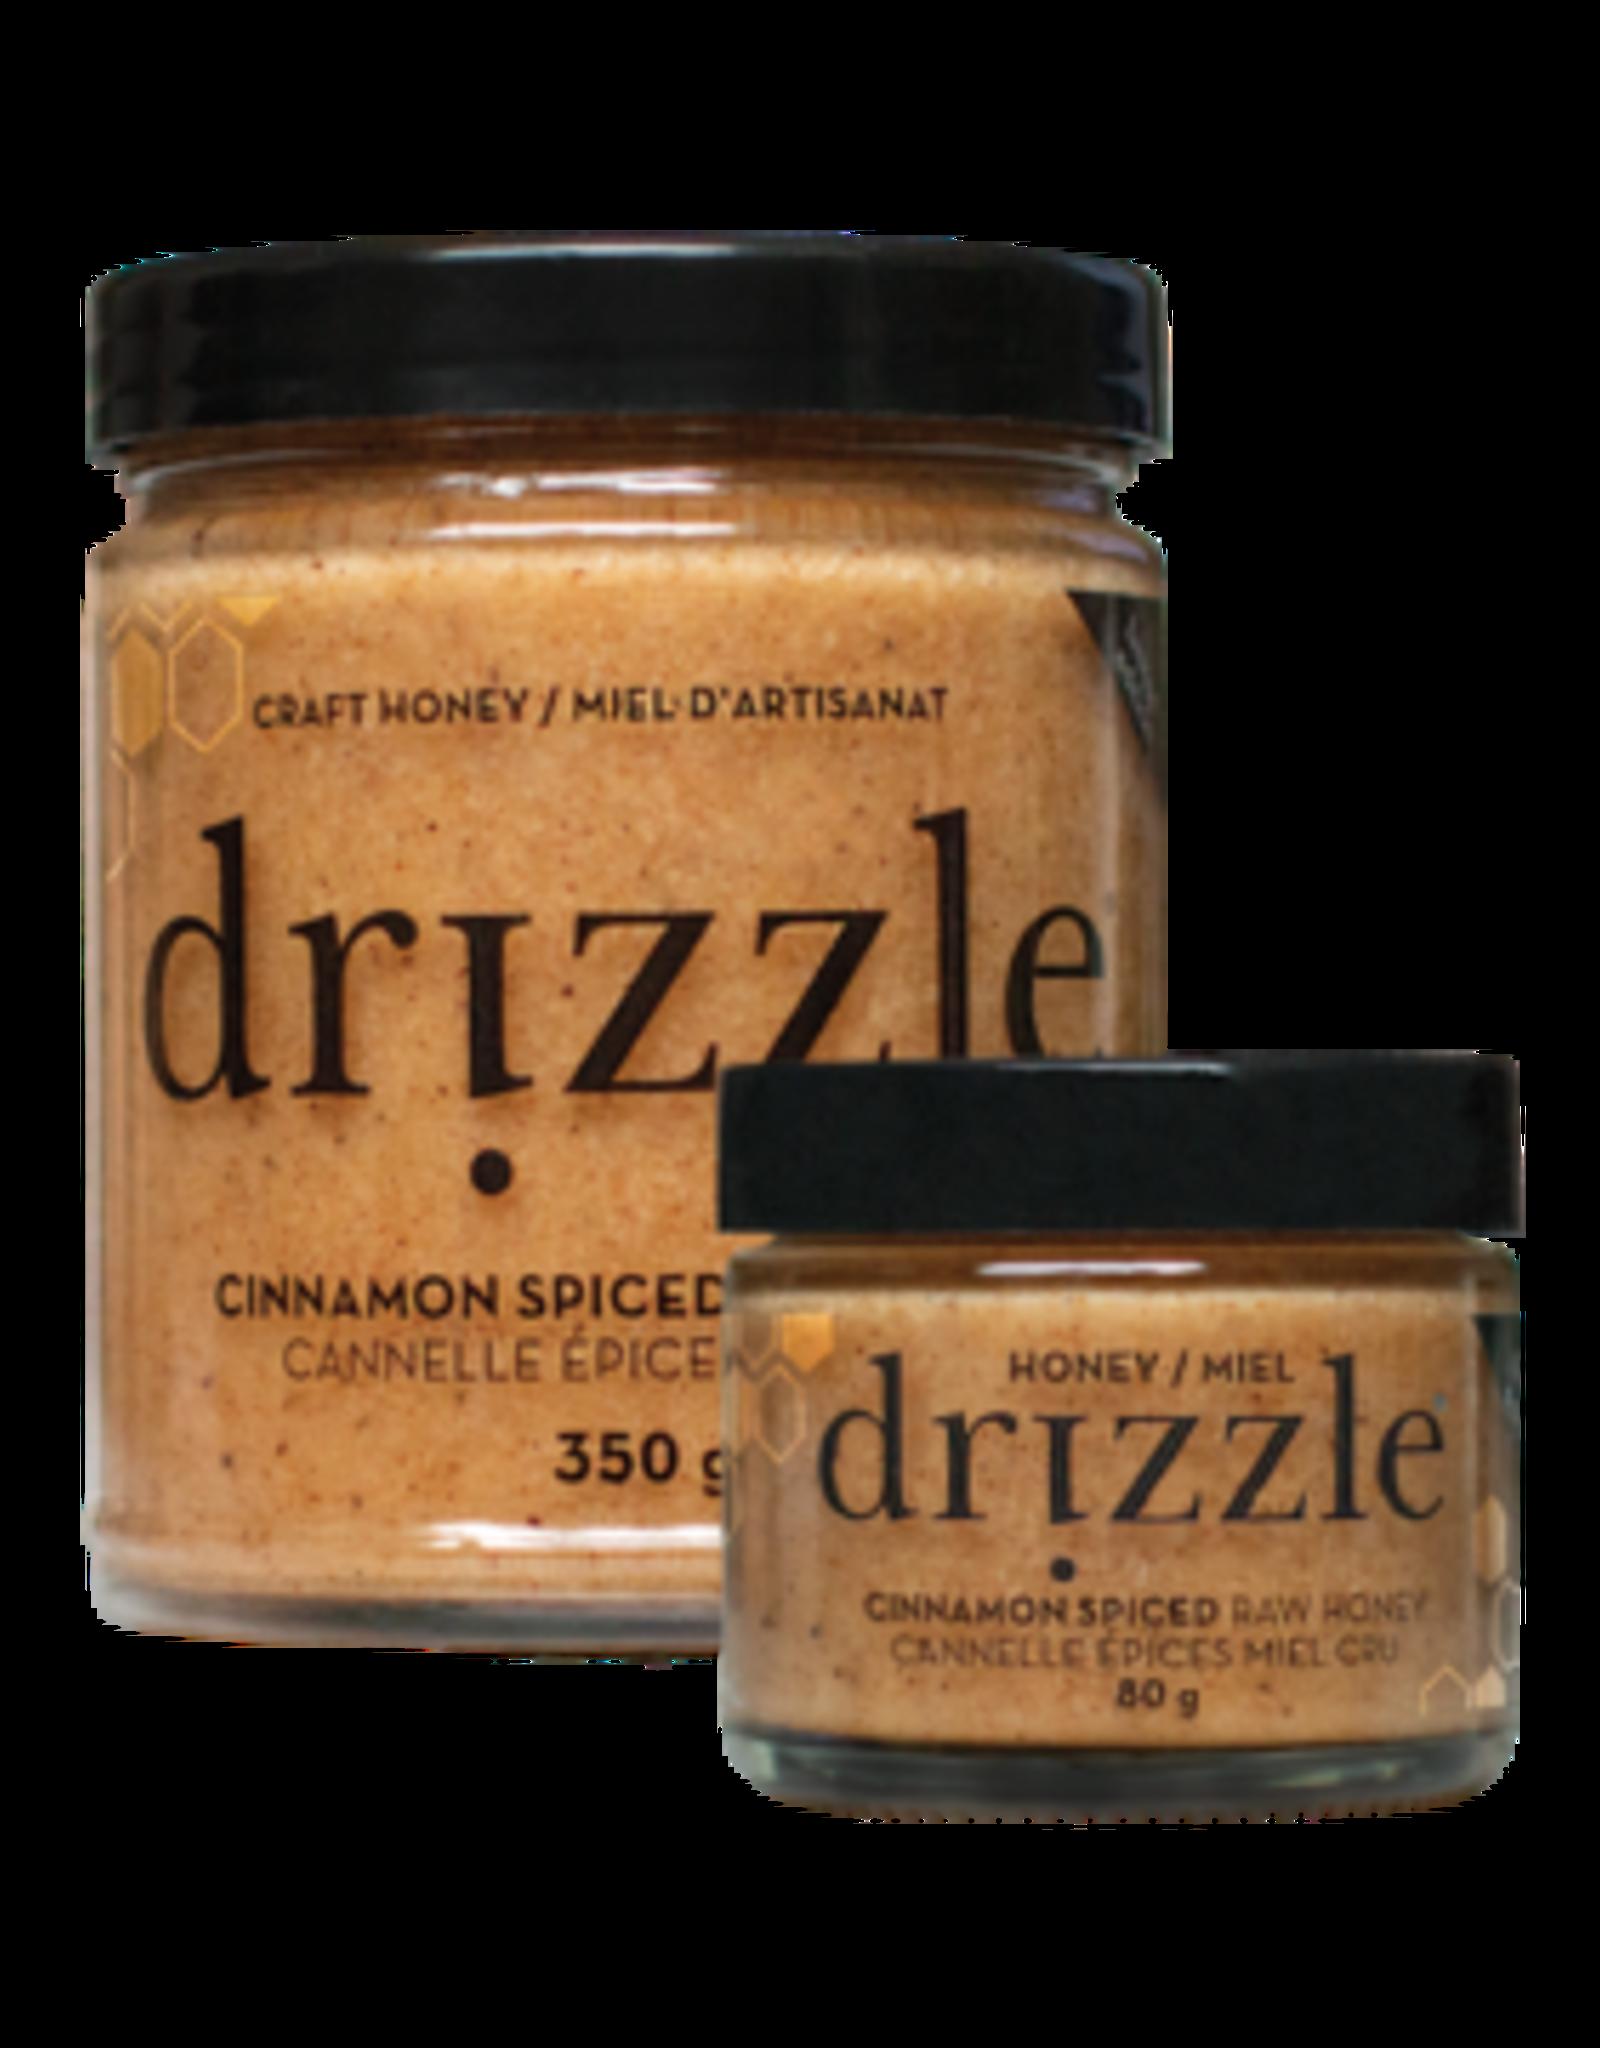 Cinnamon Spiced Raw Honey 375g